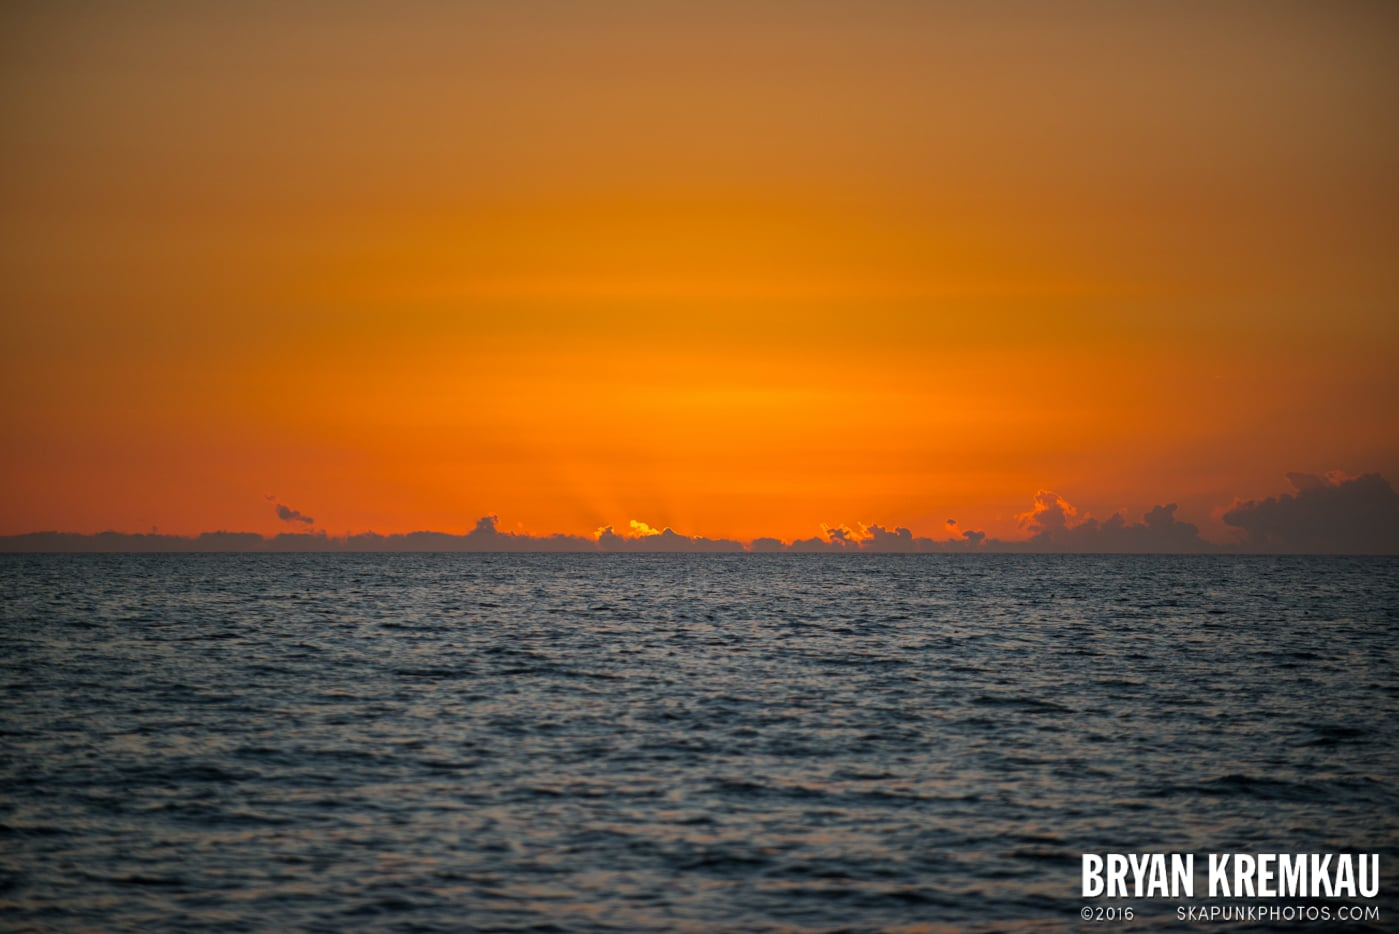 Sunsets, Astrophotography & Birds @ Venice, Florida - 10.25.14 - 11.5.14 (115)